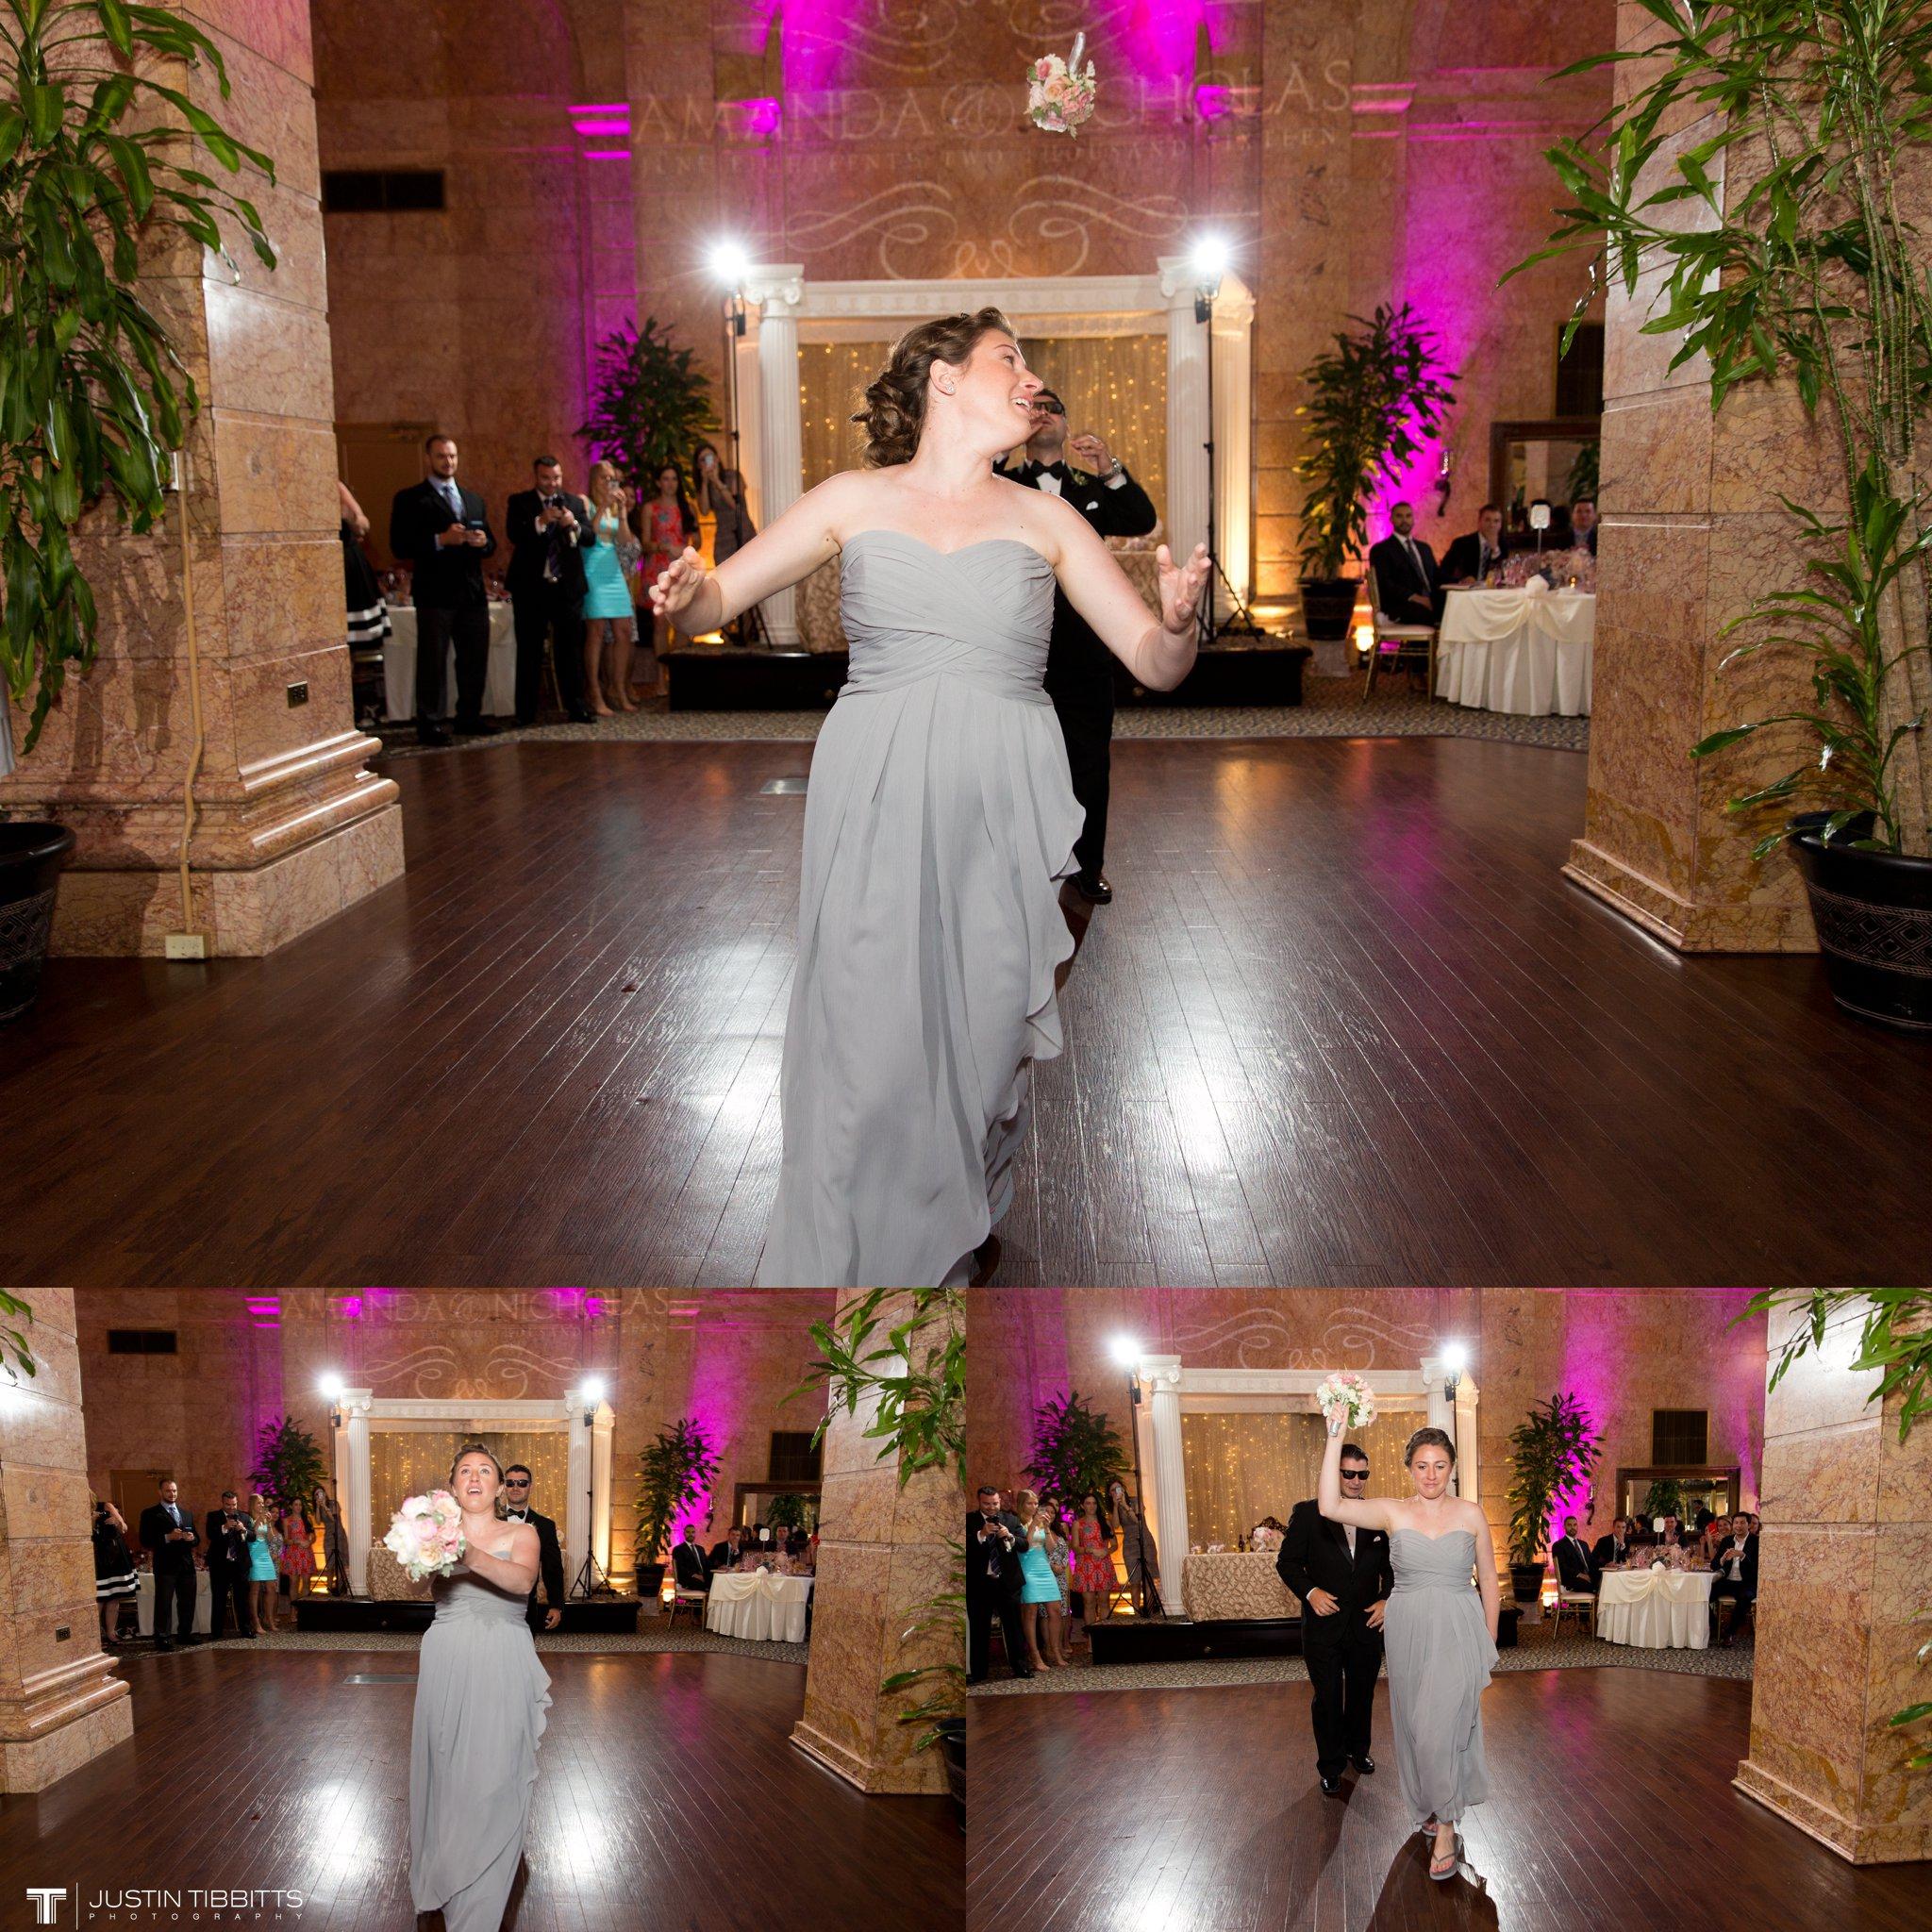 state-room-wedding-photos-with-amanda-and-nick_0144